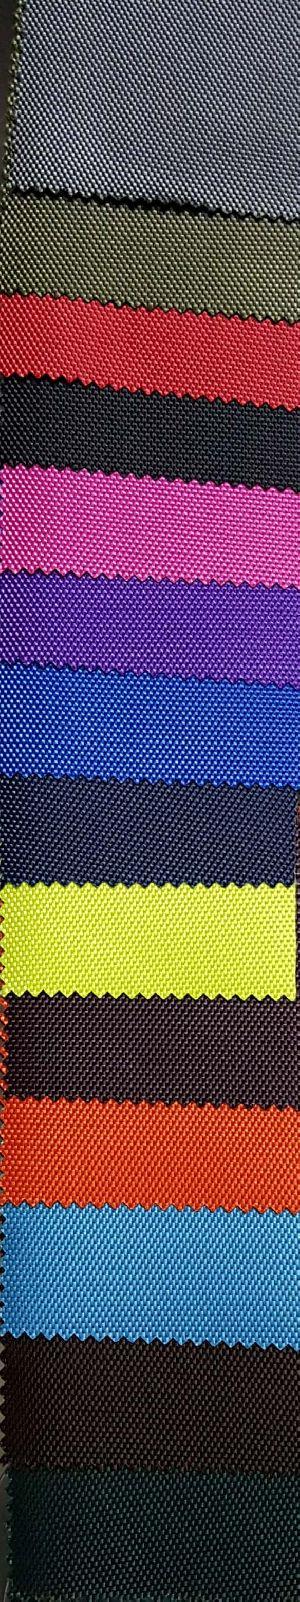 1680 Dobby Bag Fabric